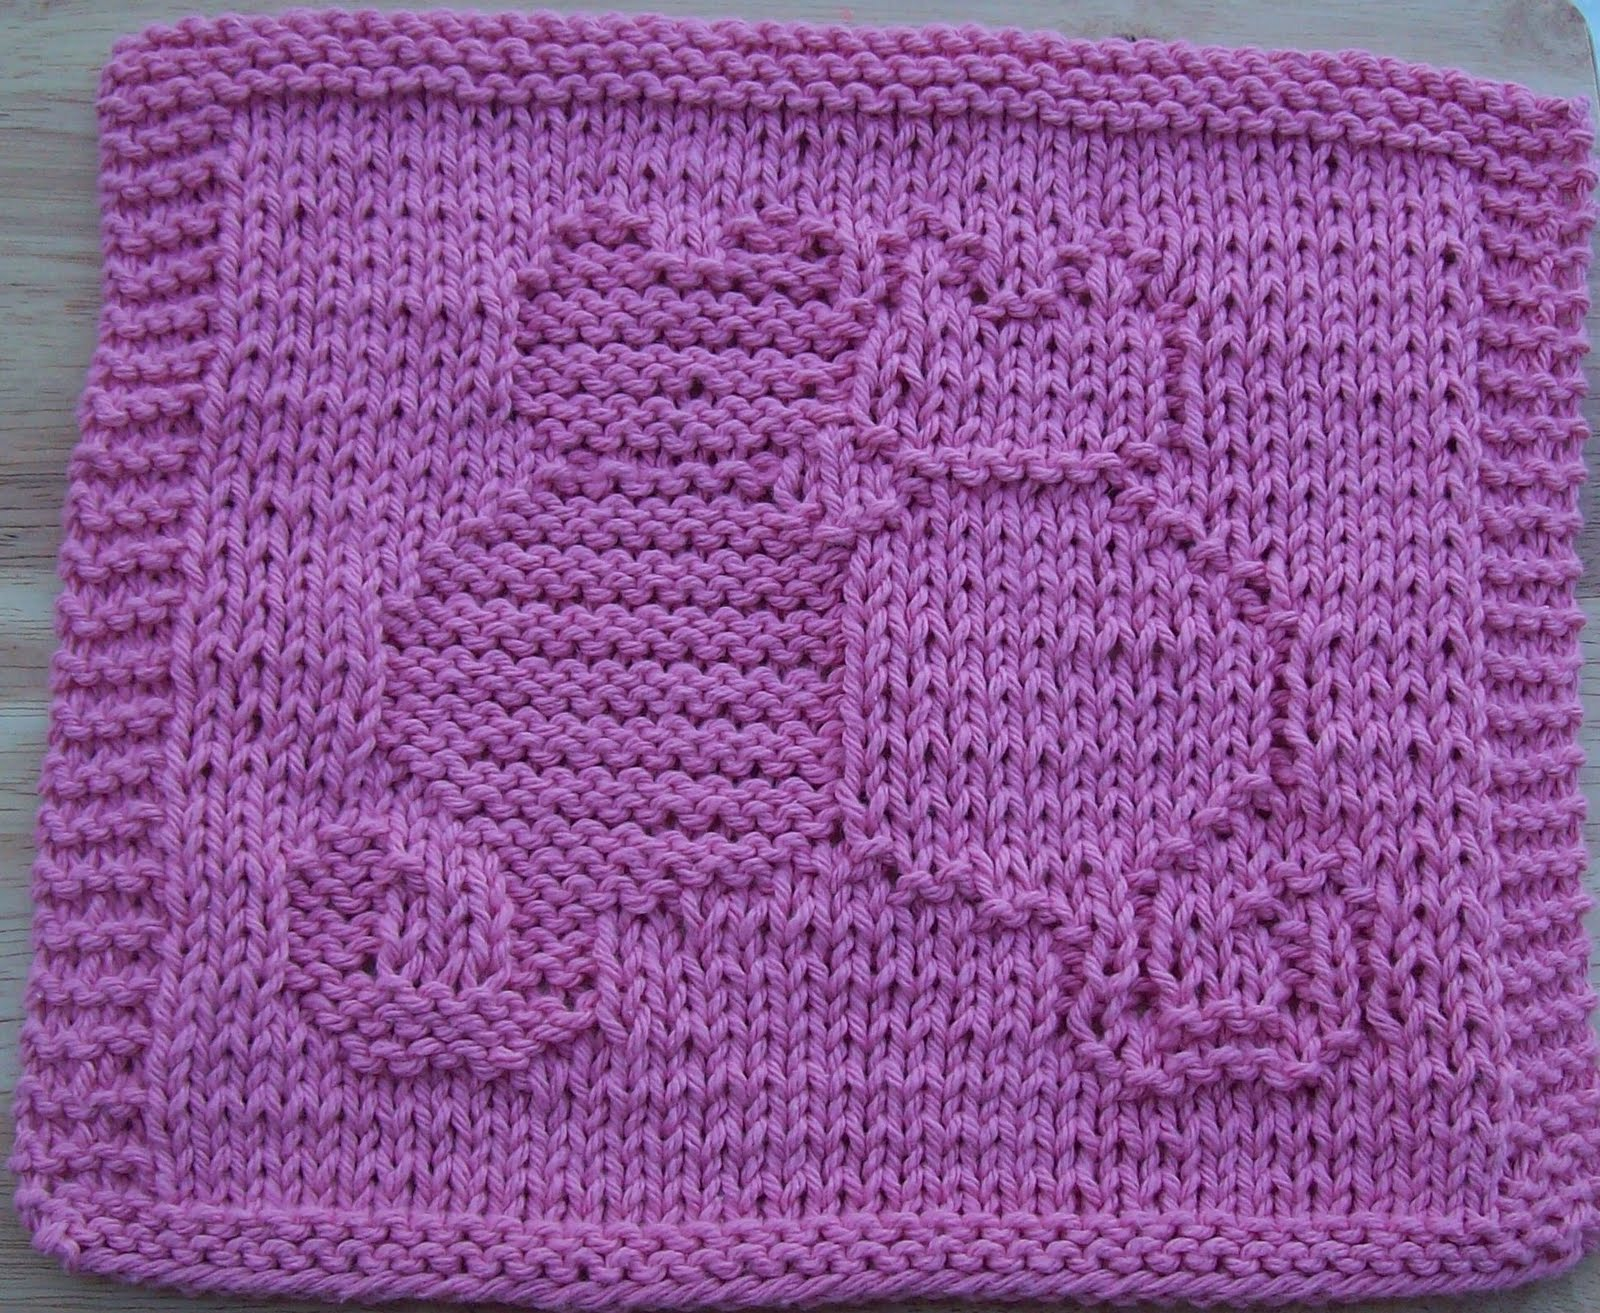 DigKnitty Designs: Snuggling Cats Knit Dishcloth Pattern